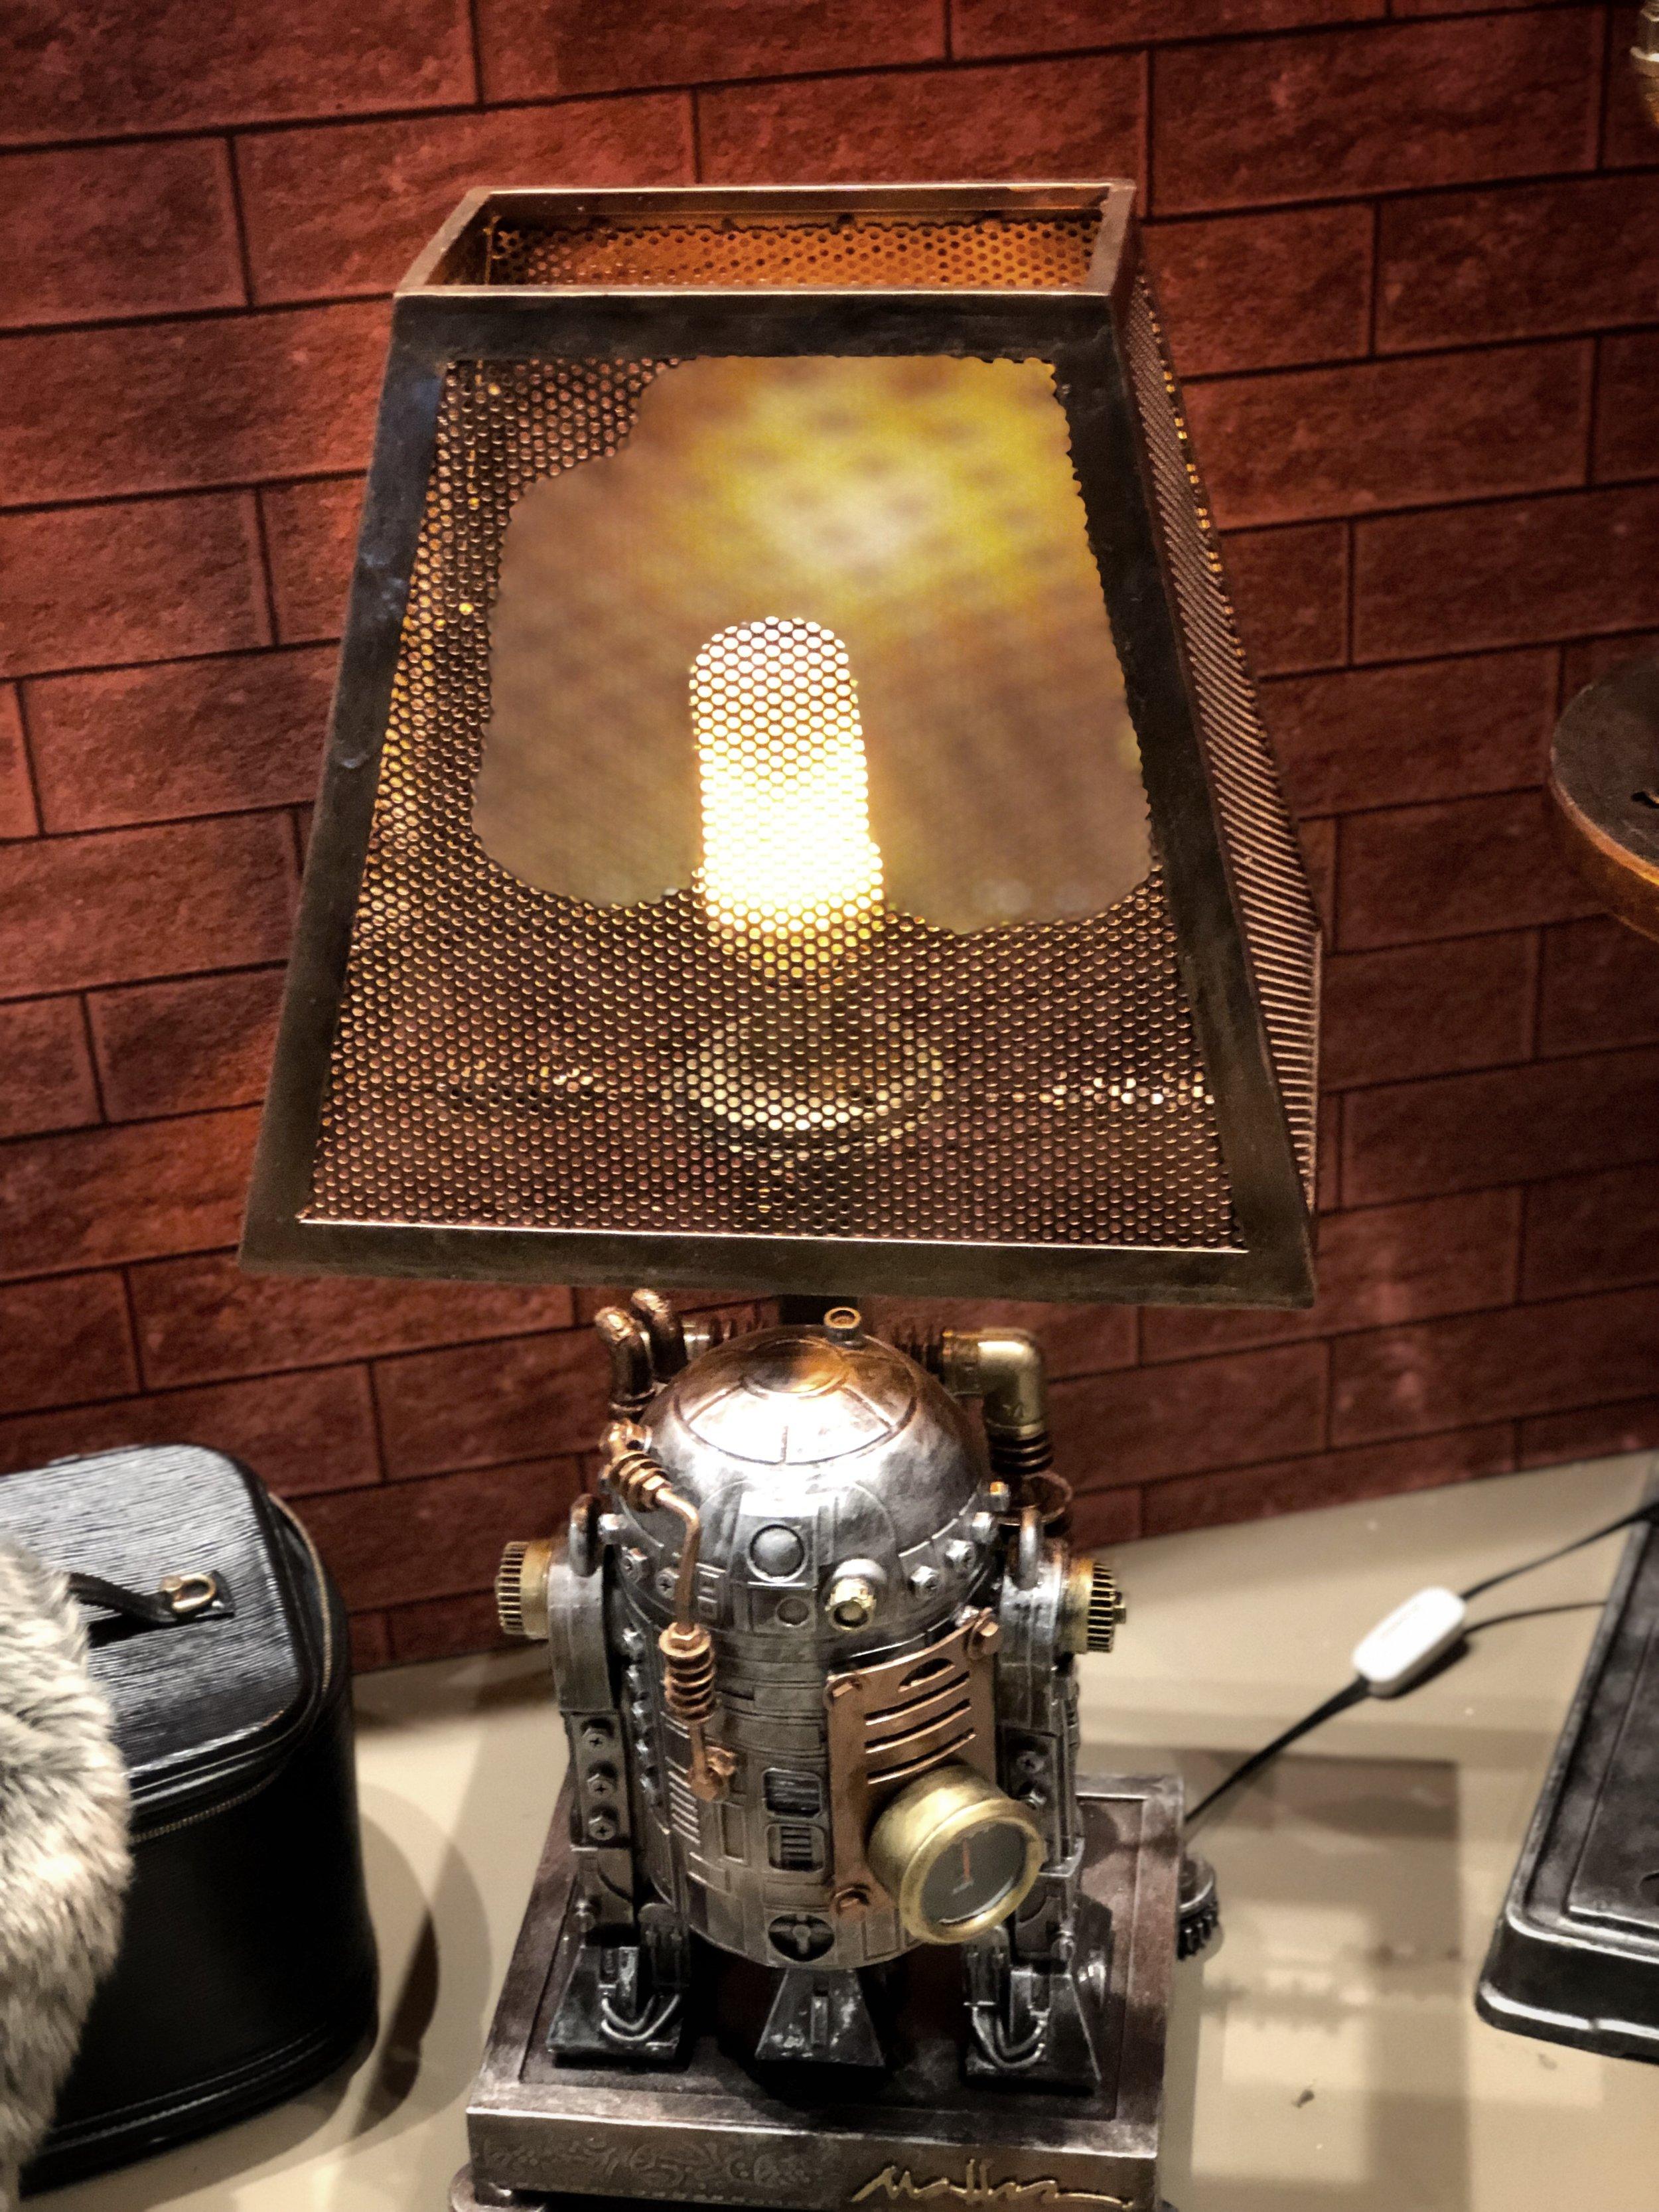 R2D3 Lamp by Retrospect Studio, designed by Ram Mallari